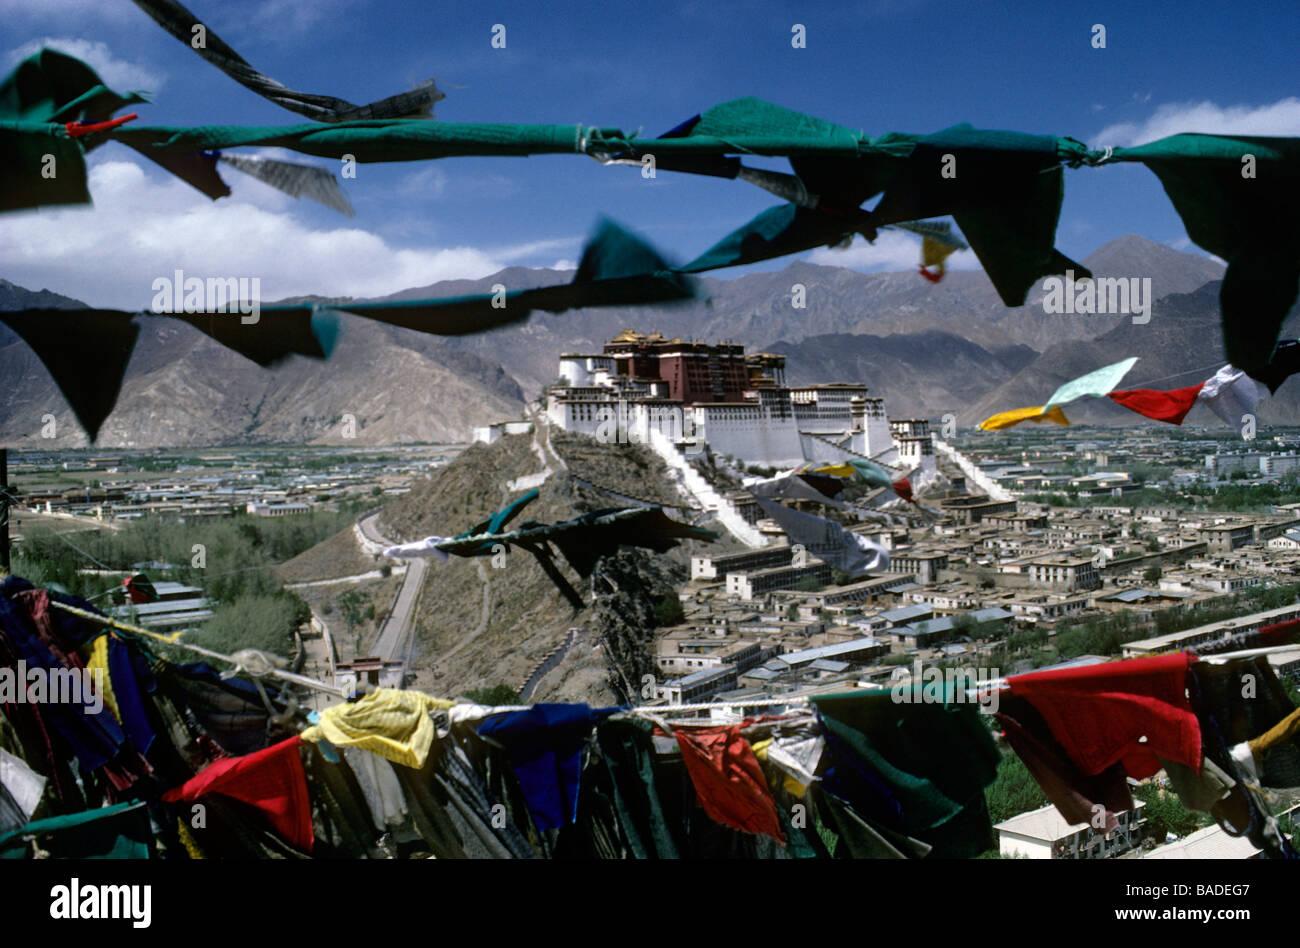 China, Tibet, Lhassa, Potala Palace, classified as World Heritage by UNESCO - Stock Image